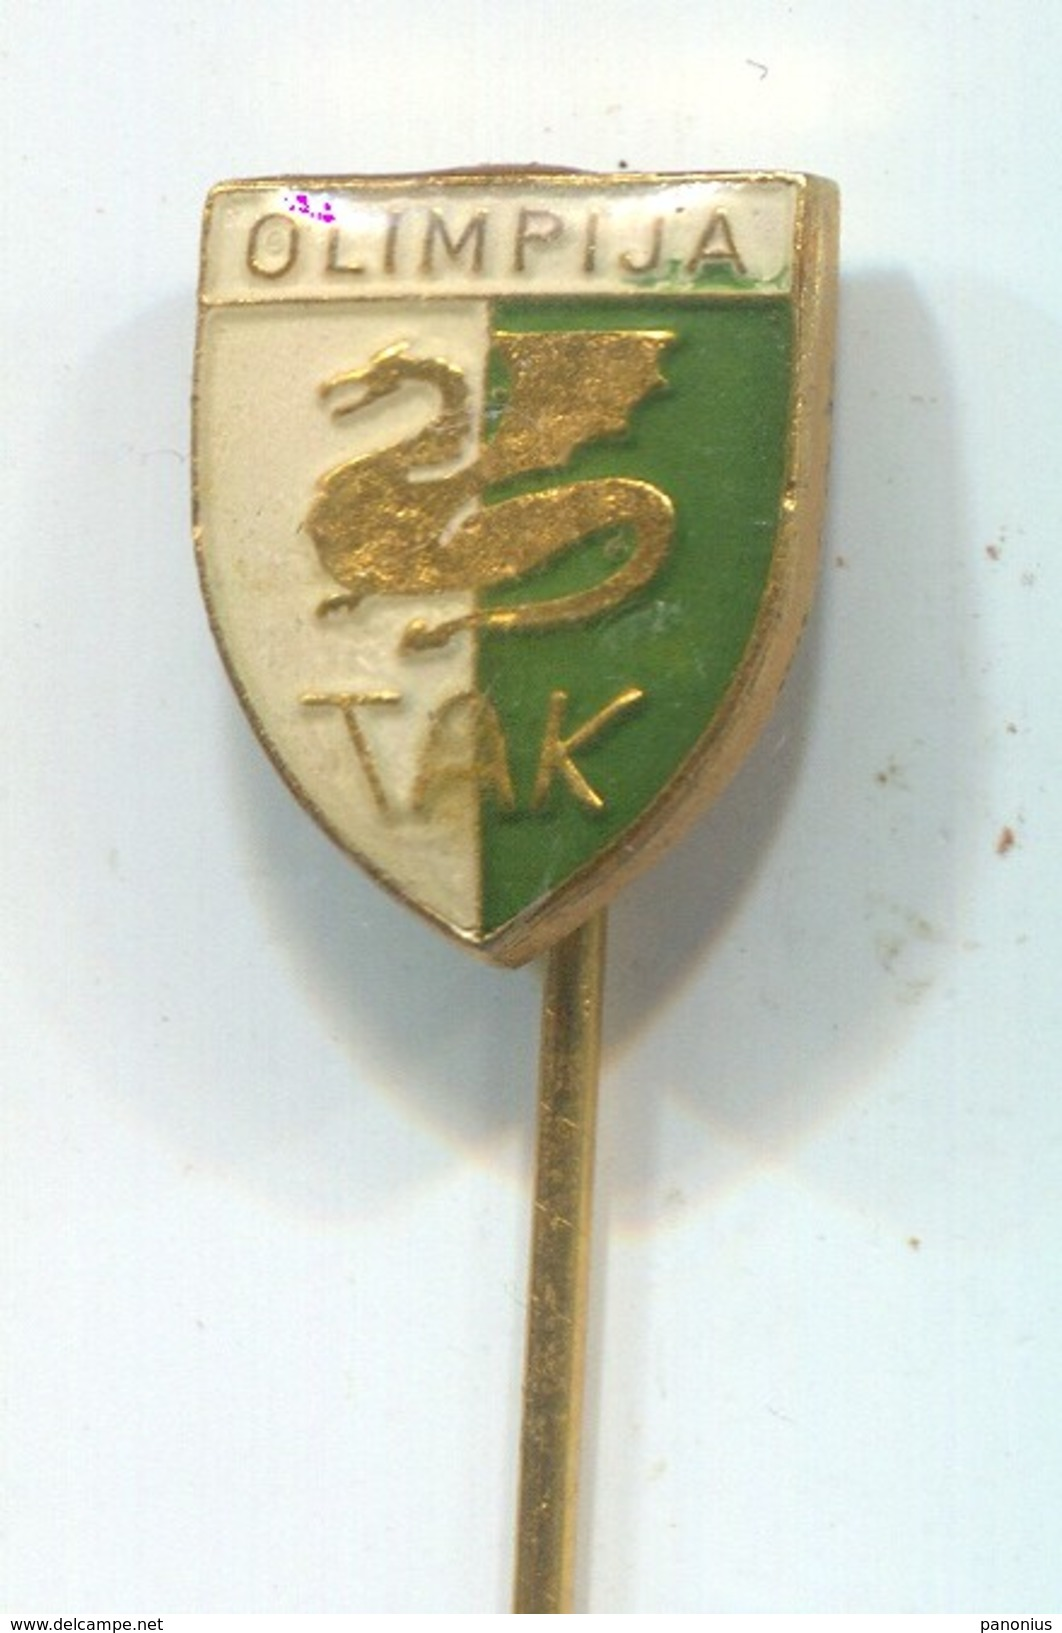 Weightlifting - OLIMPIJA TAK, Ljubljana Slovenia, Vintage Pin Badge, Abzeichen - Weightlifting